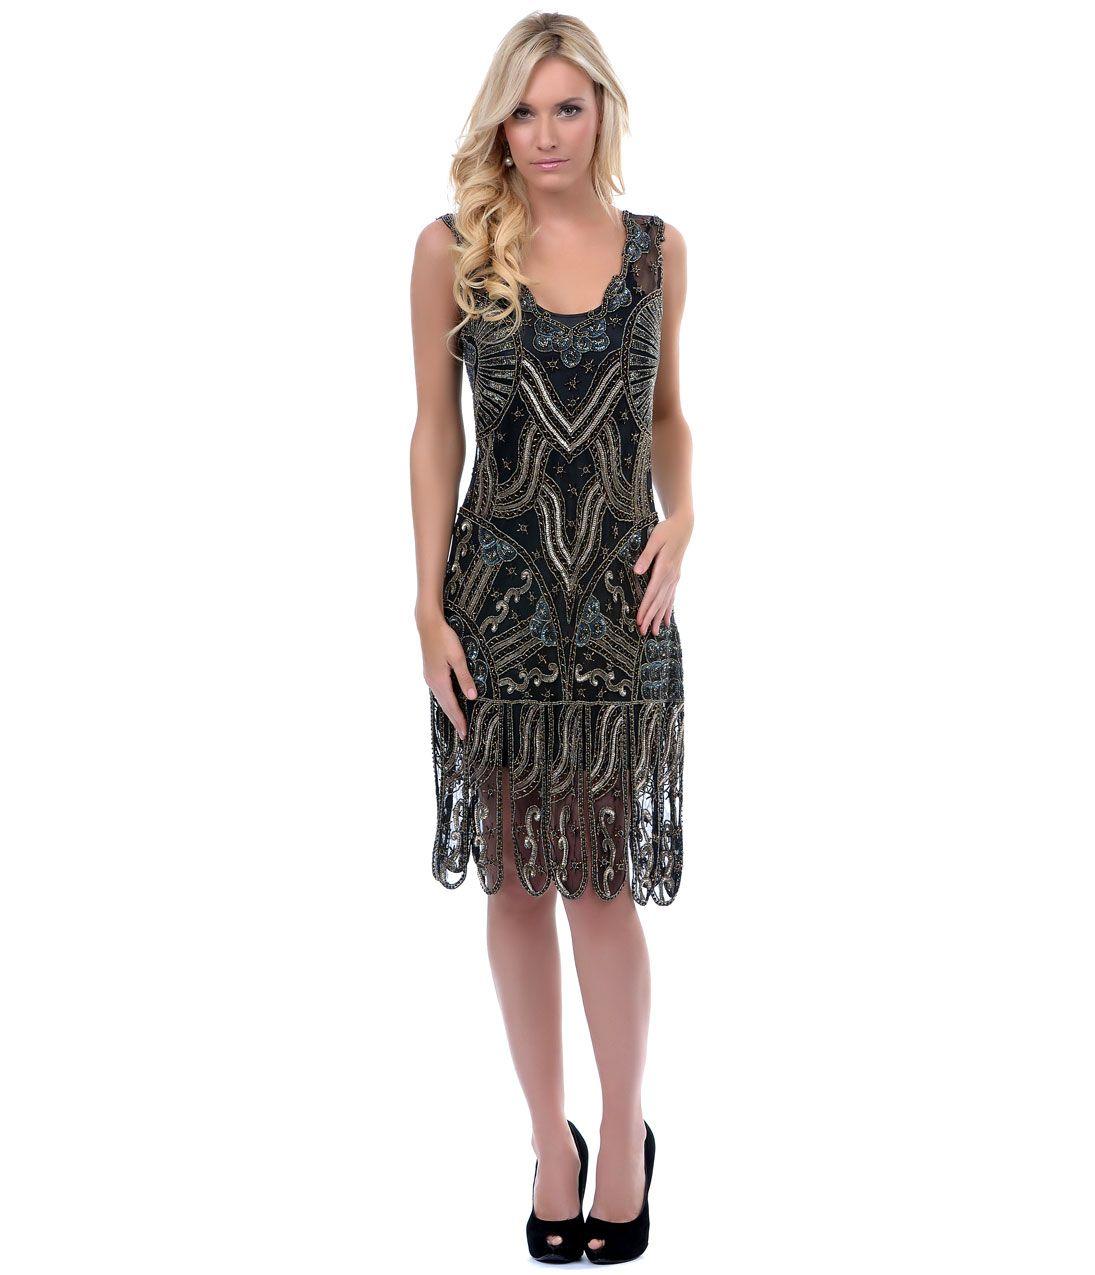 1920s Downton Abbey Inspired Clothing | Pinterest | Gatsby dress ...